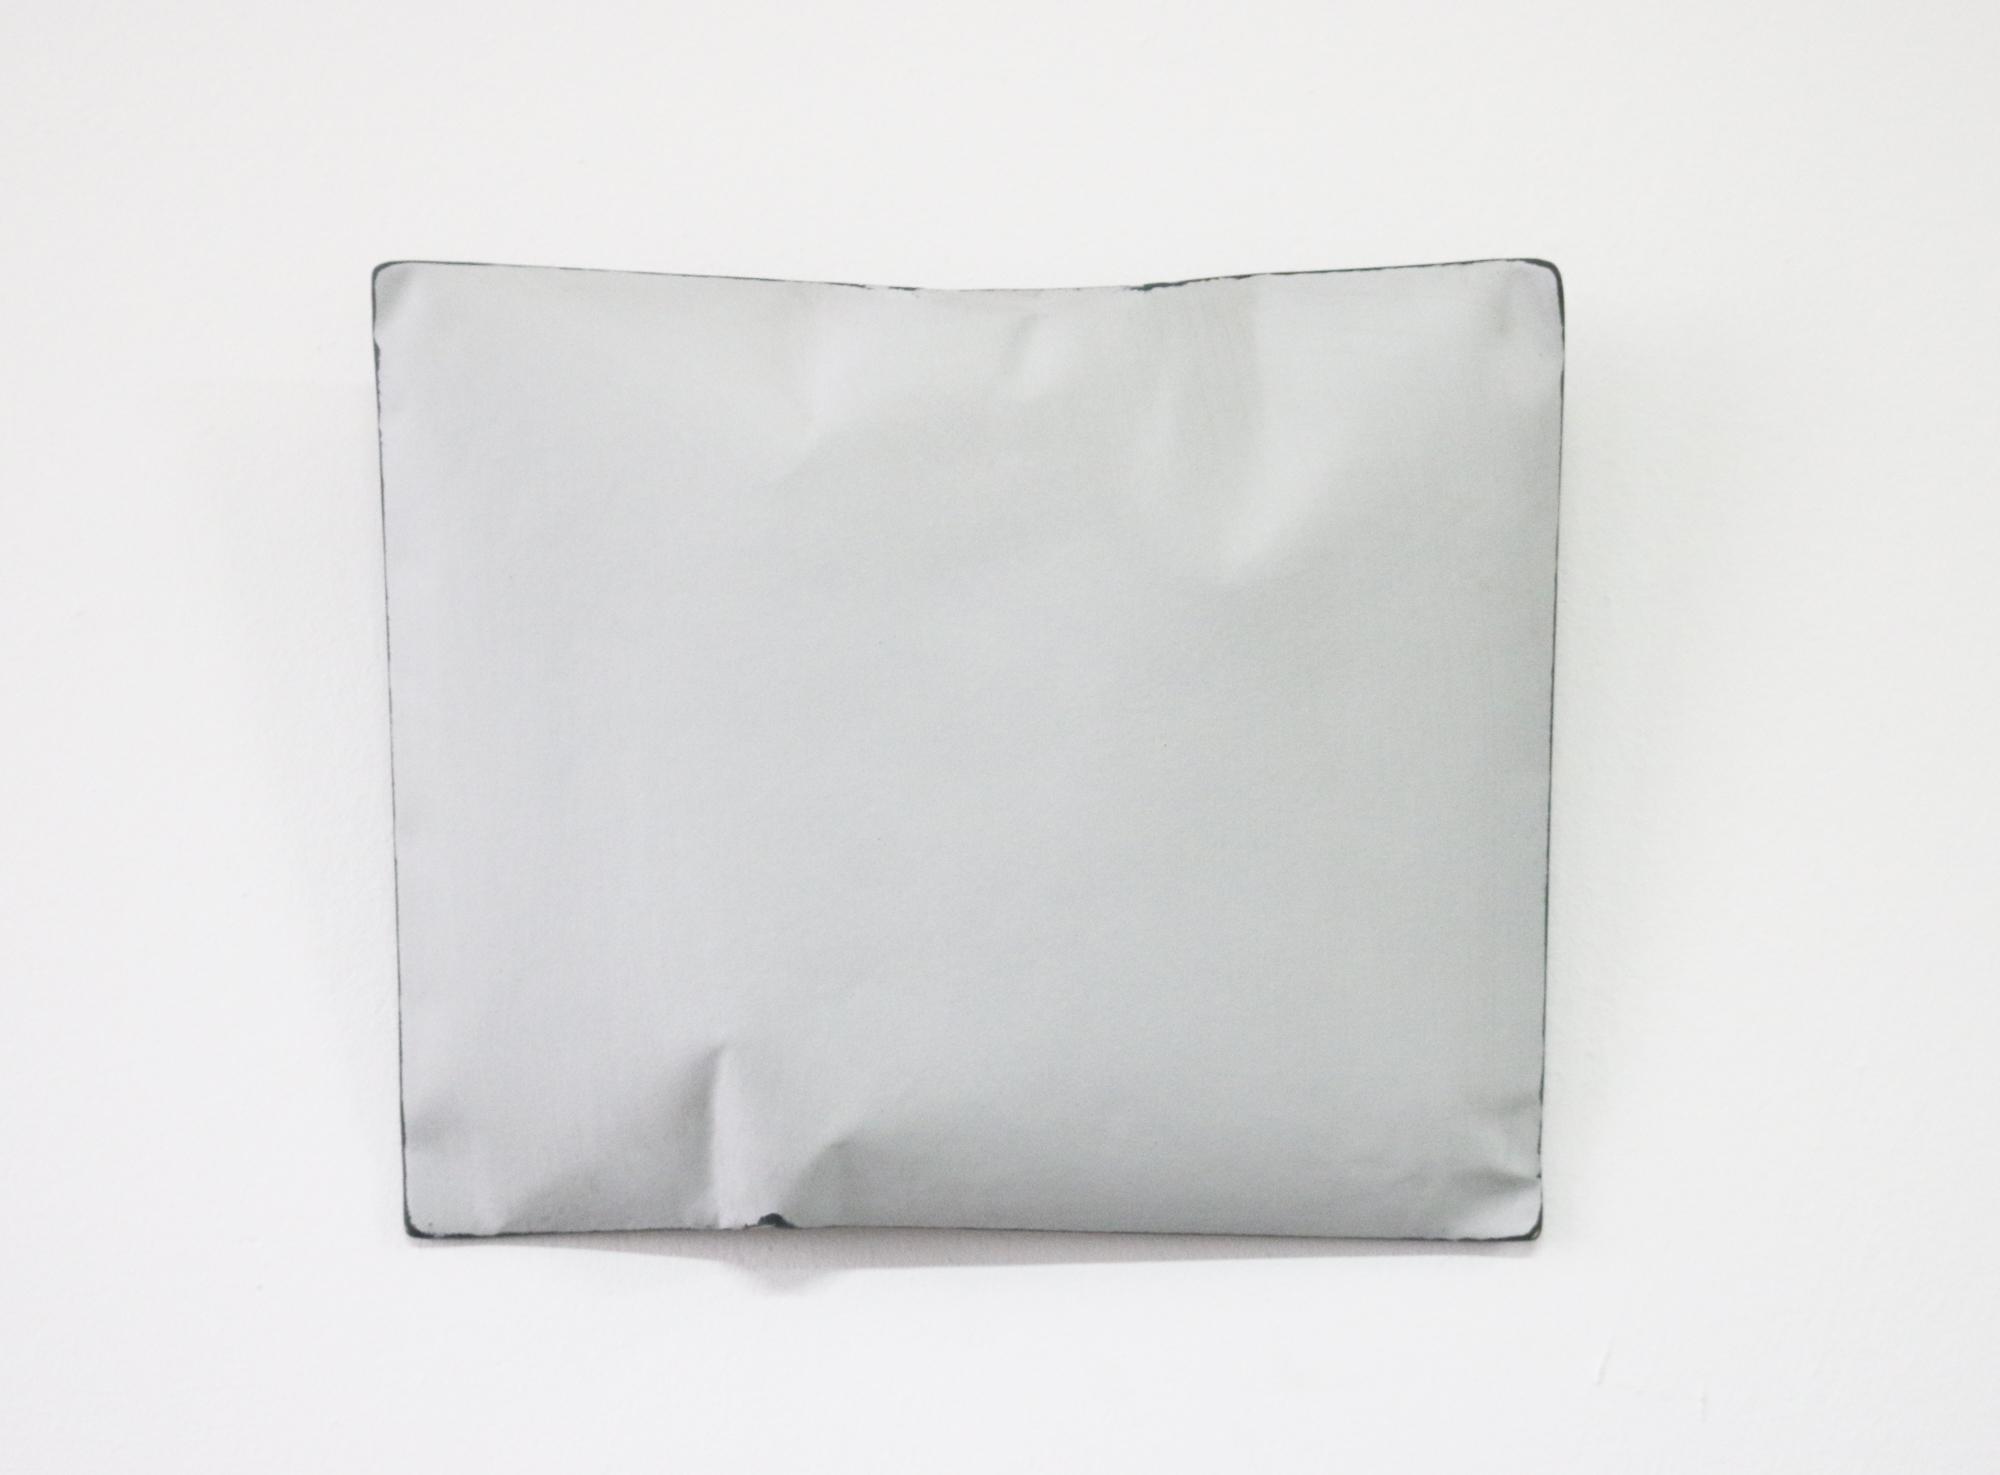 Johan De Wit, Untitled, 2018, Paper, Resin, Marble, Acrylic, 22 x 18 x 5 cm, Affinity Art